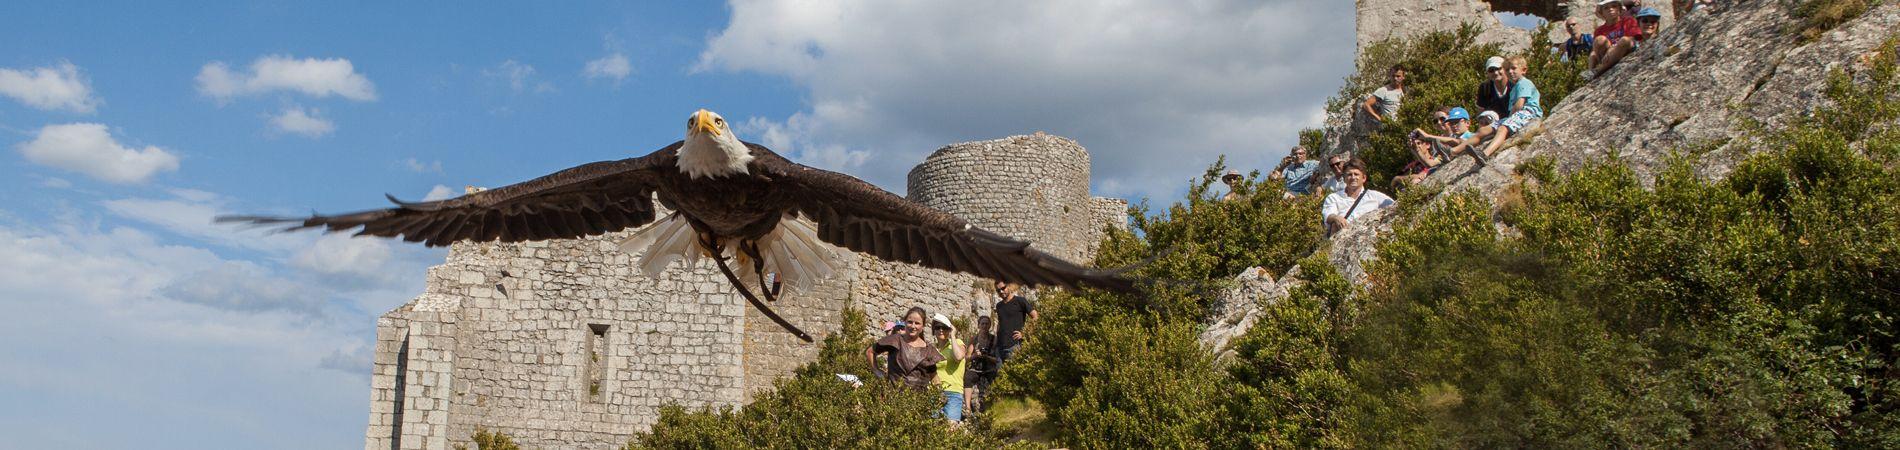 Le château Cathare de Peyrepertuse